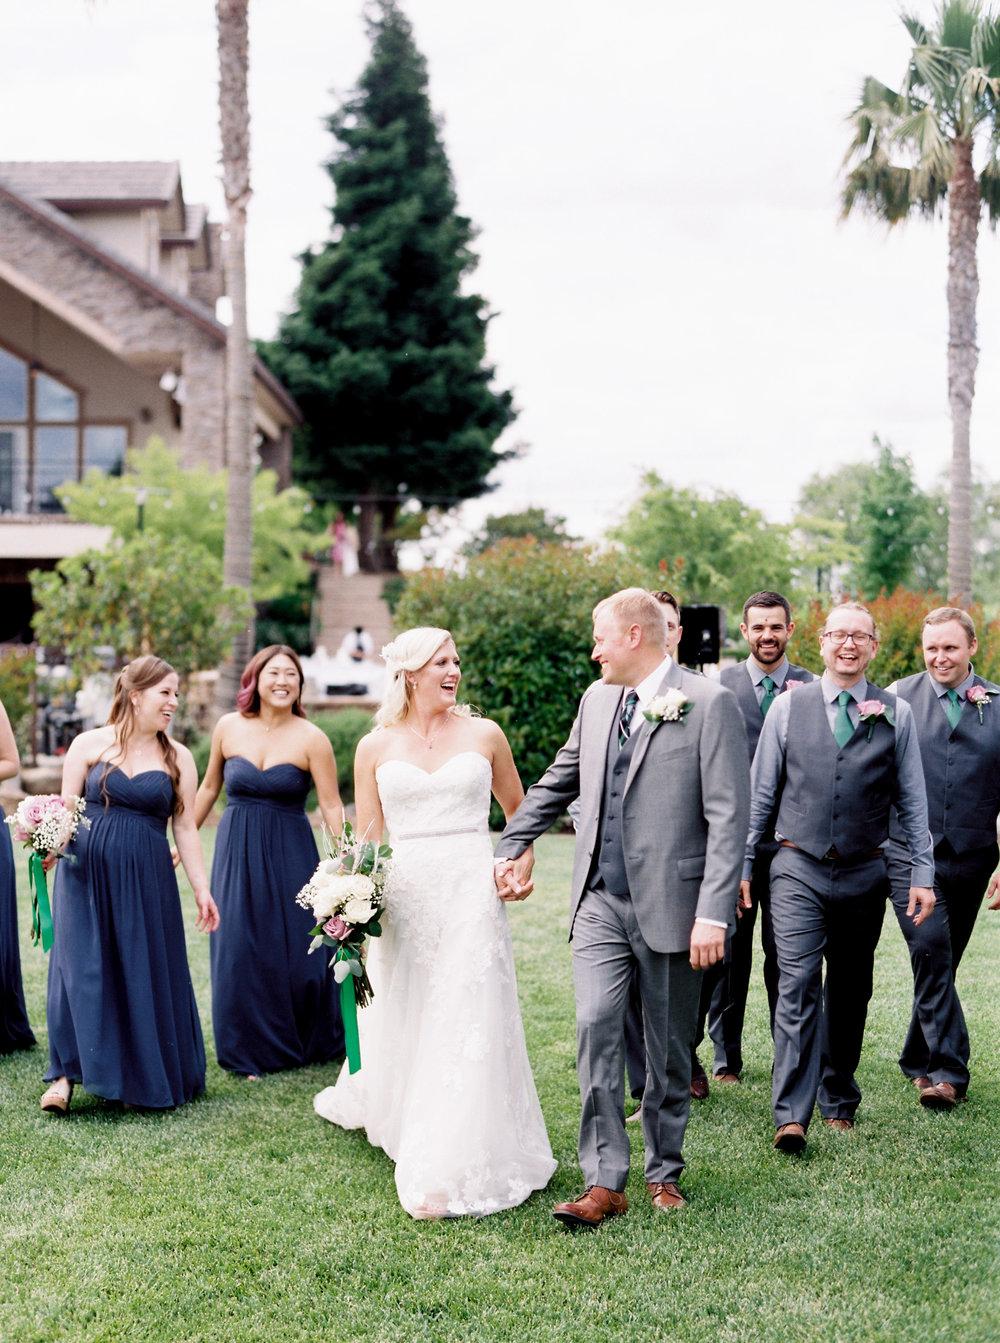 wolfe-heights-event-center-wedding-sacramento-california-wedding-55.jpg